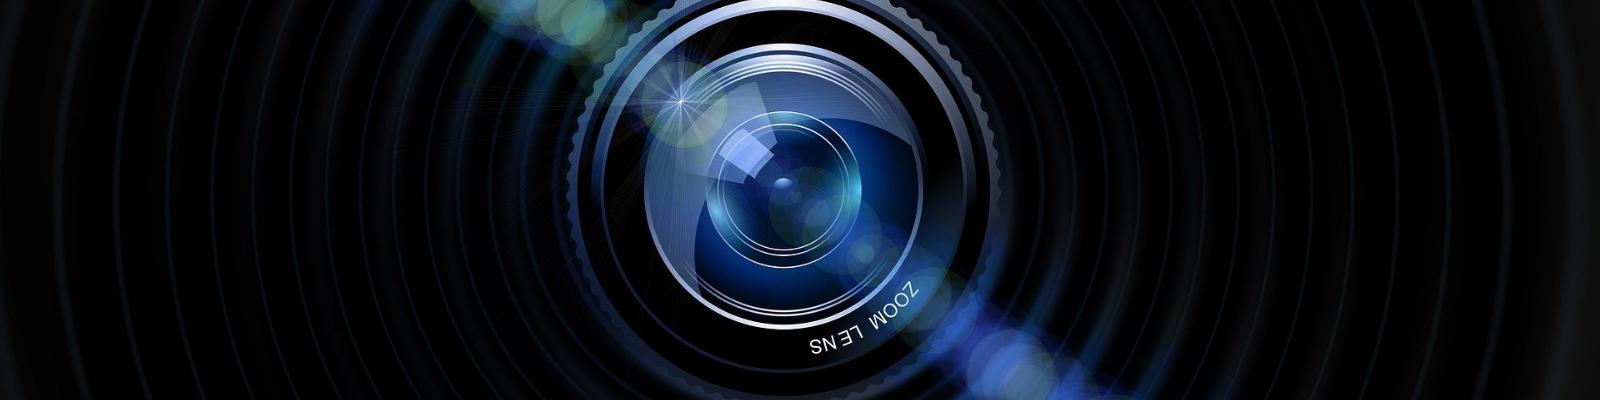 photography tips blog post